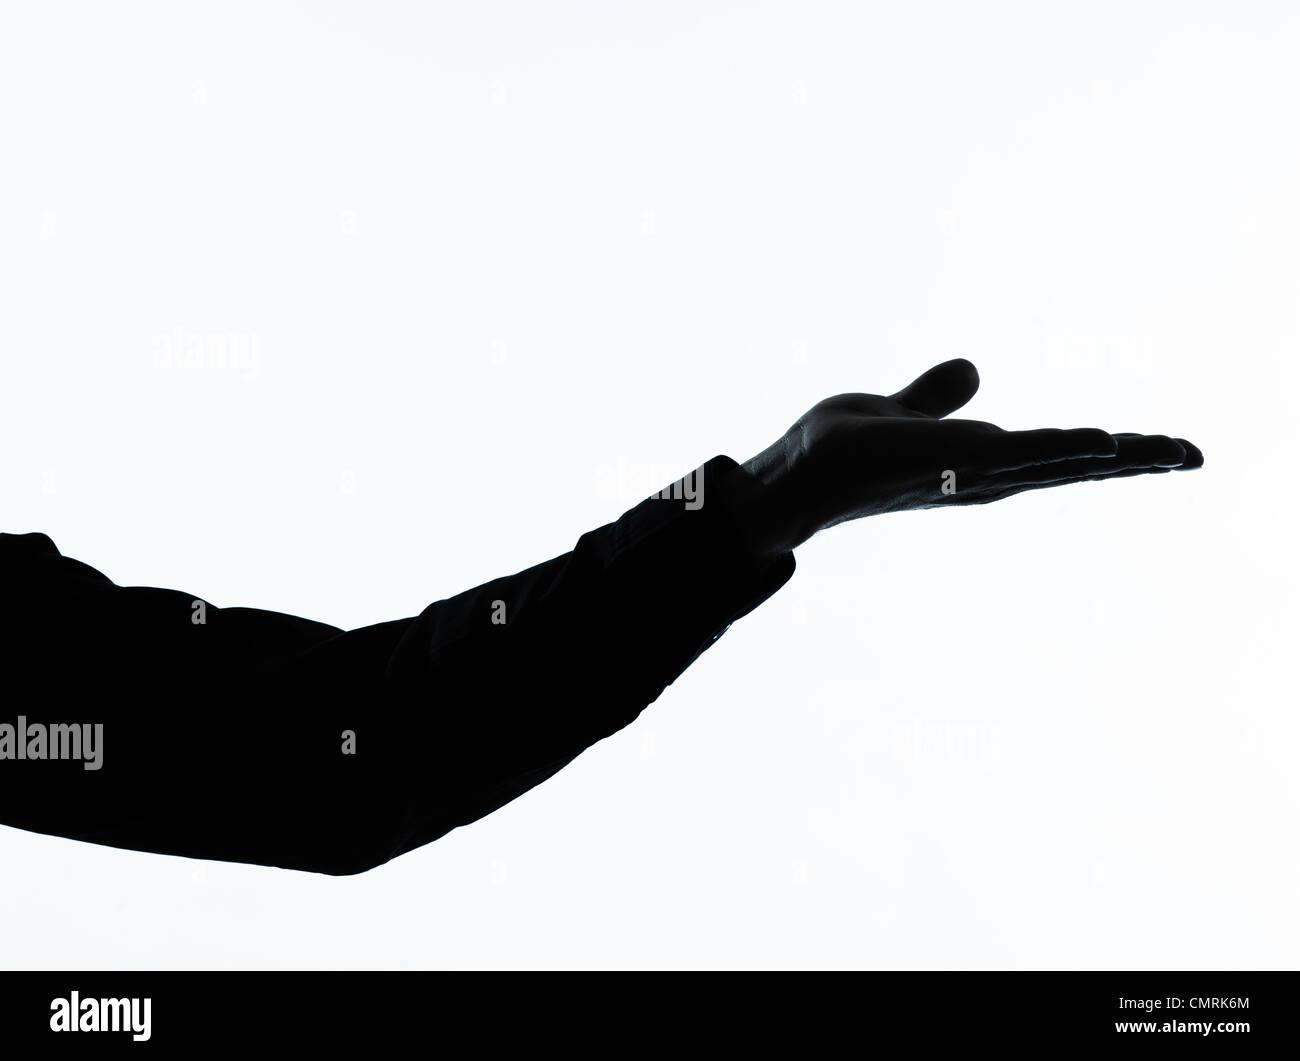 Un hombre caucásico mano vacía abrir retrato silueta en studio aislado sobre fondo blanco. Imagen De Stock